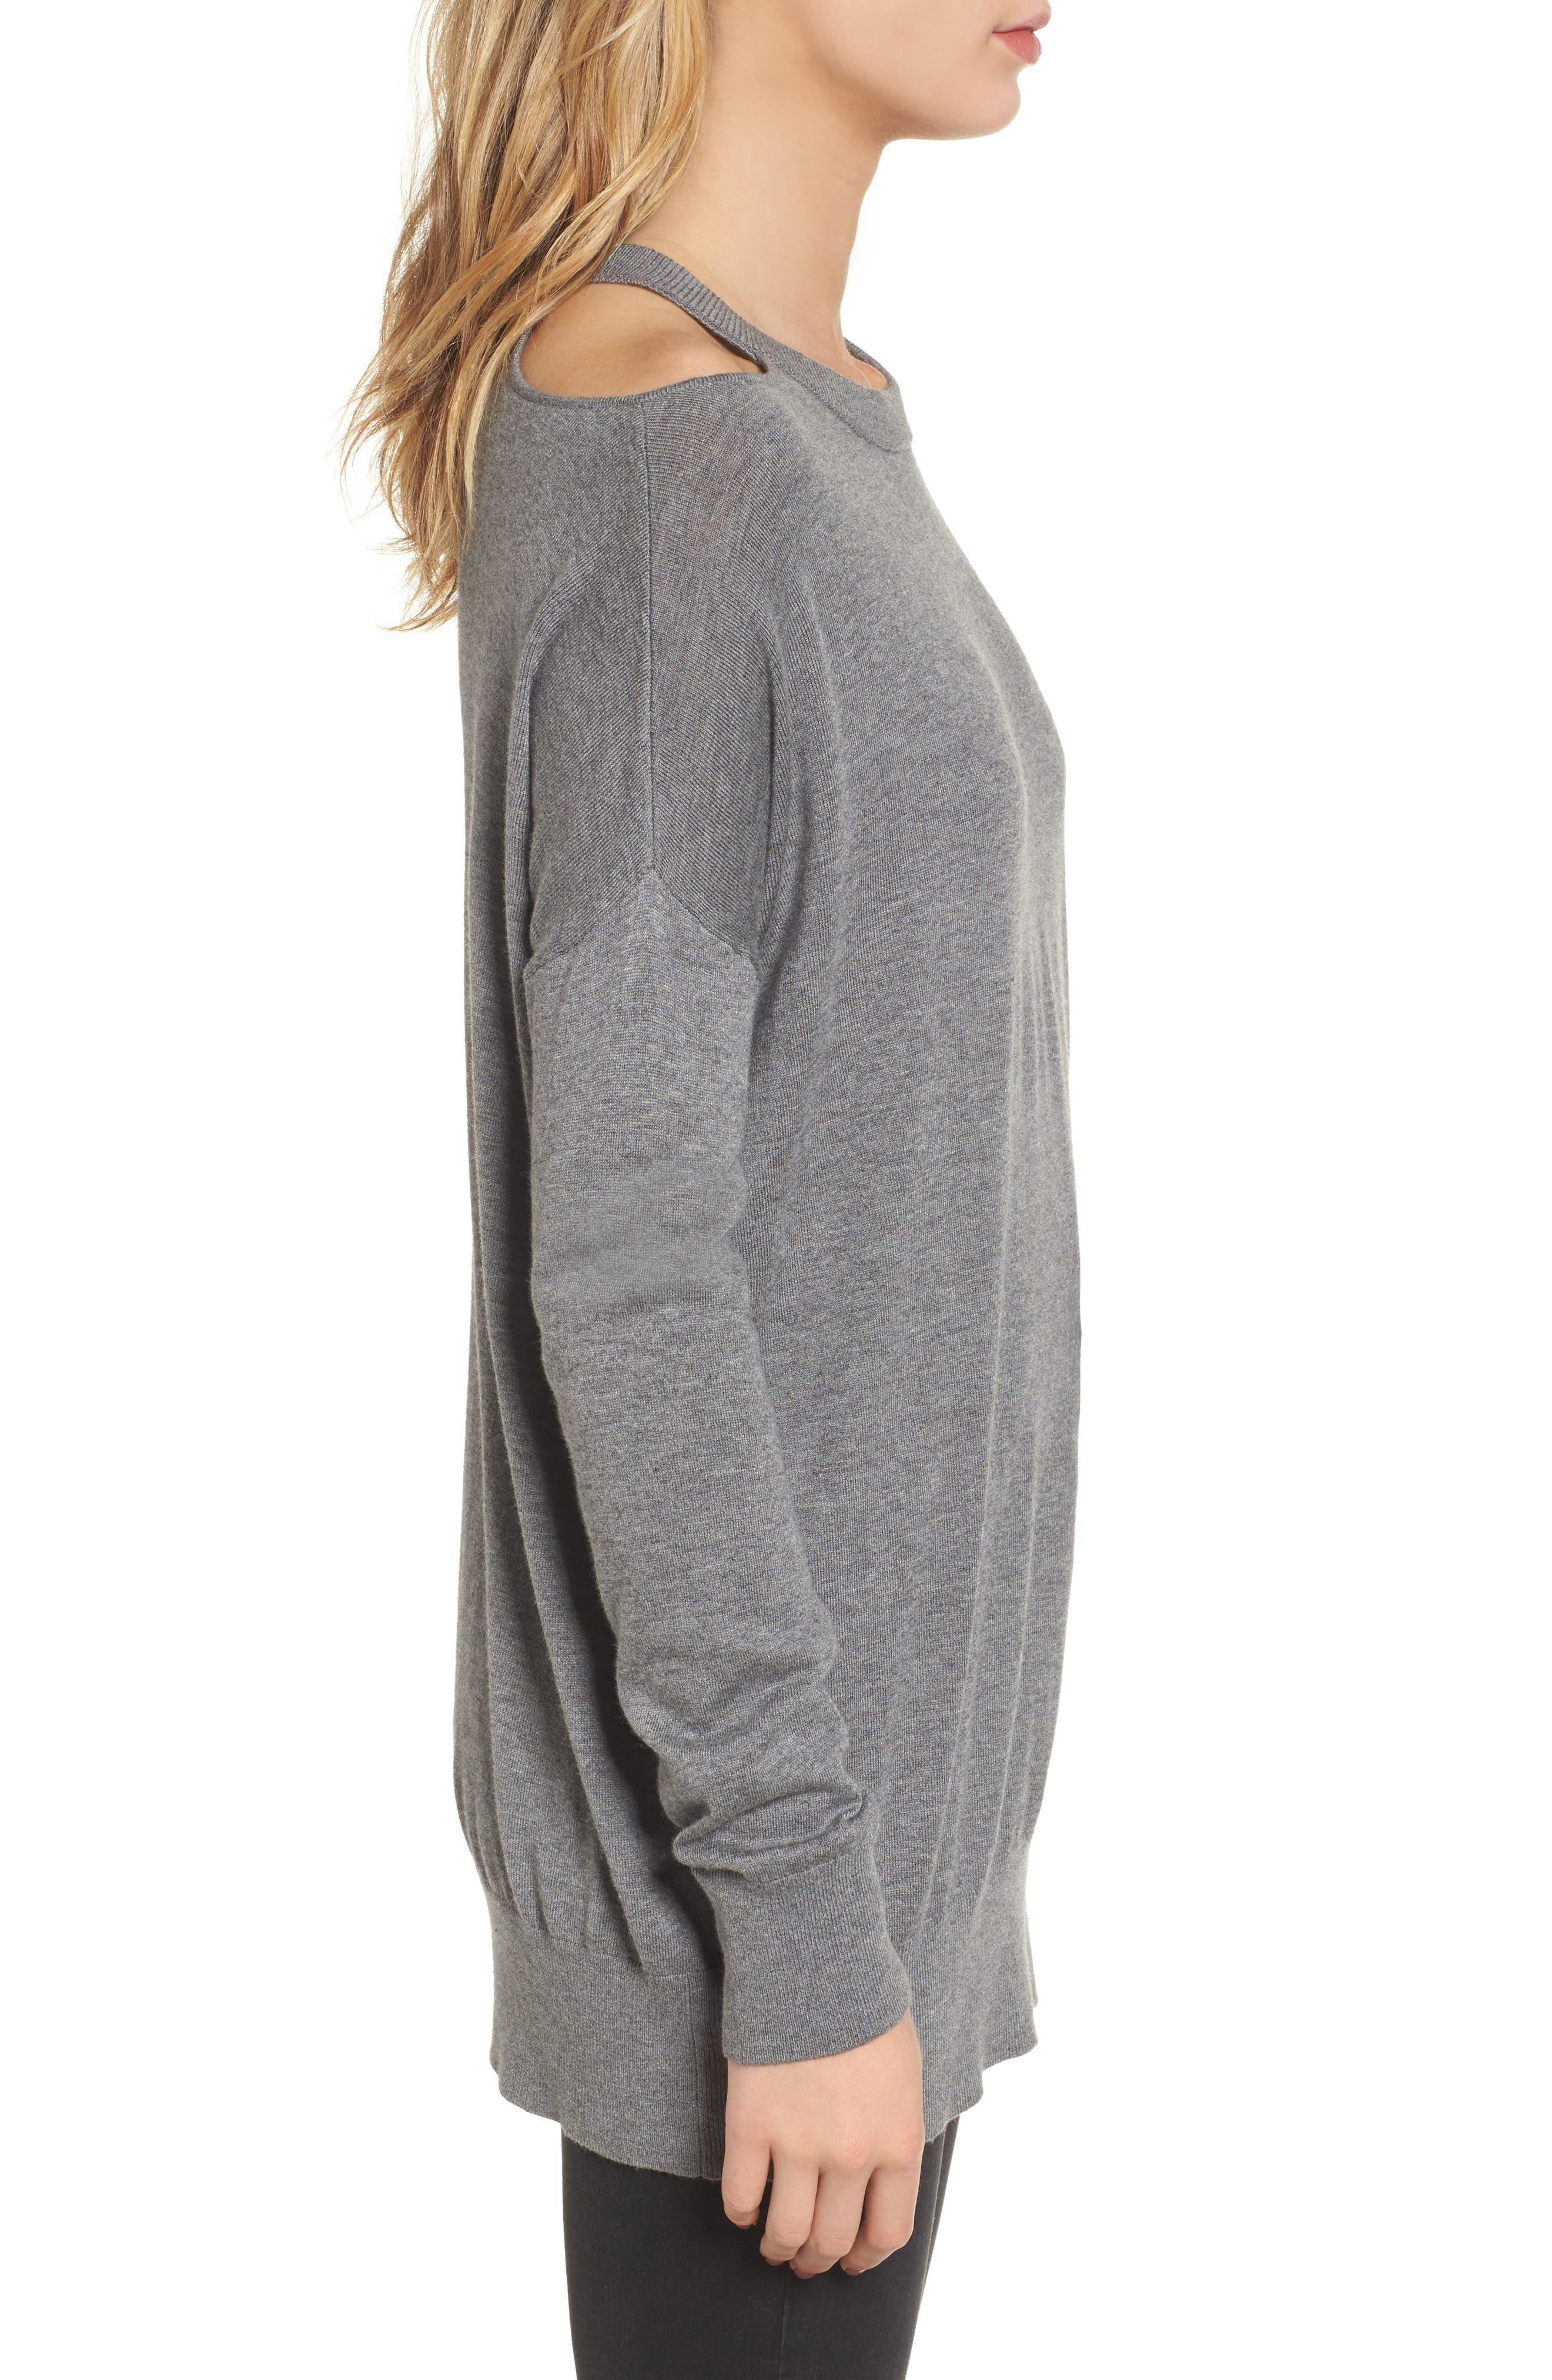 Canarise Cutout Sweater,                             Alternate thumbnail 3, color,                             Heather Cinder